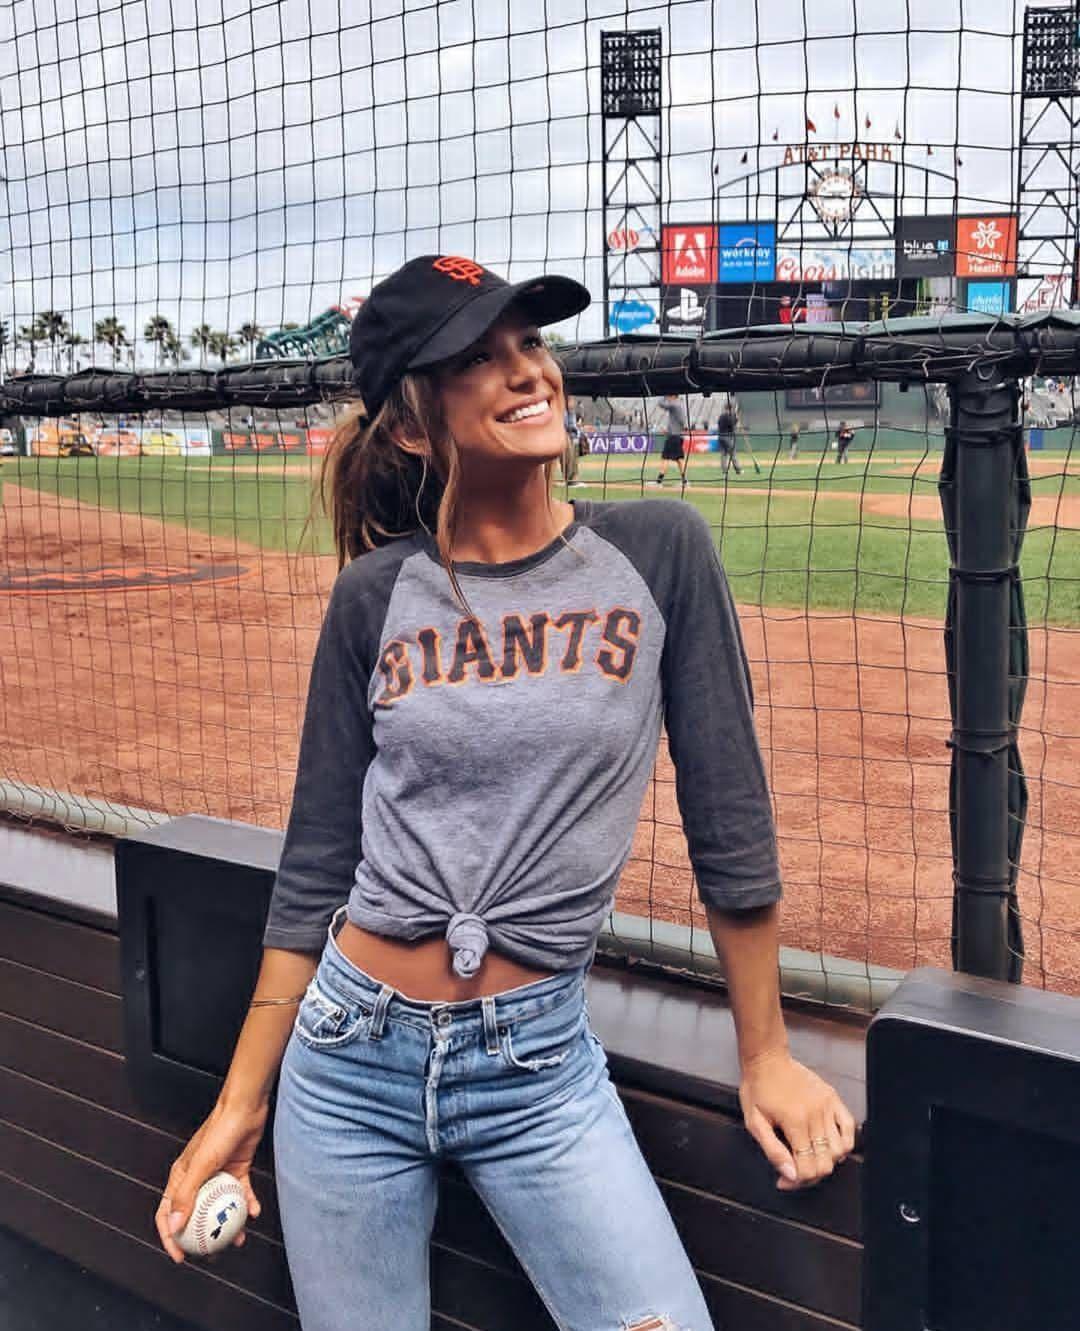 Sports Gaming clothes, Baseball game outfits, Fashion